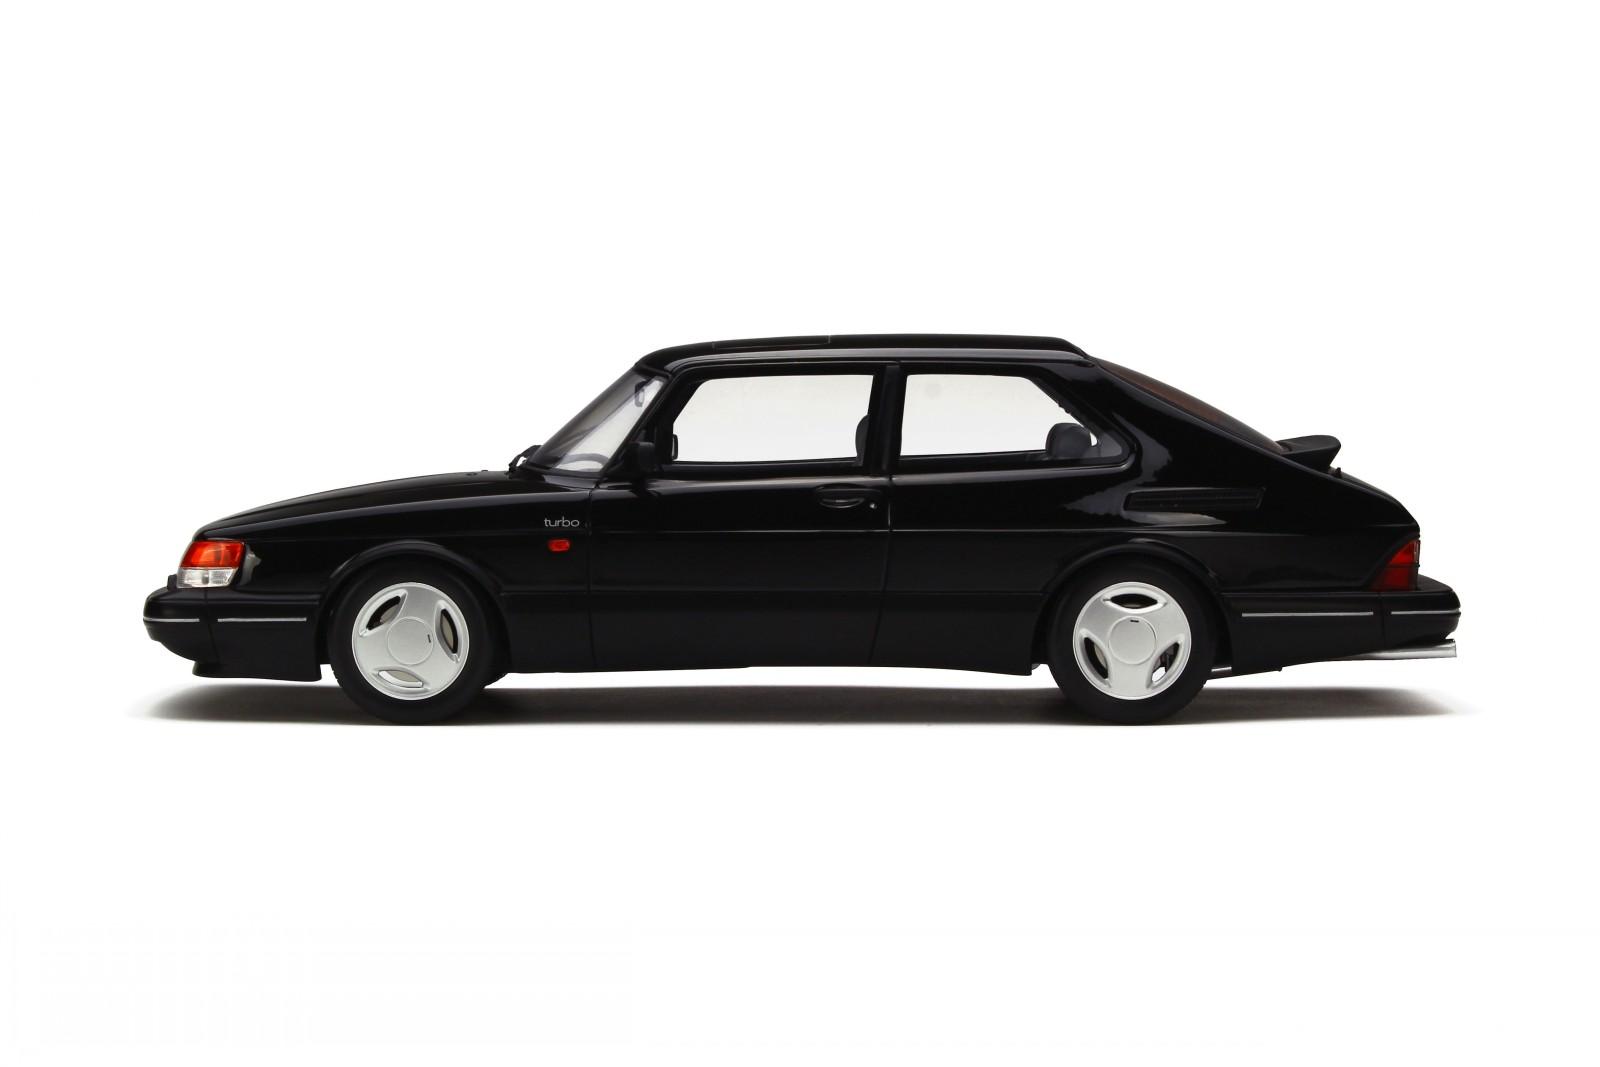 Saab-900-Turbo-Phase-1-black-resin-modelcar-OT678-Otto-1-18 thumbnail 4